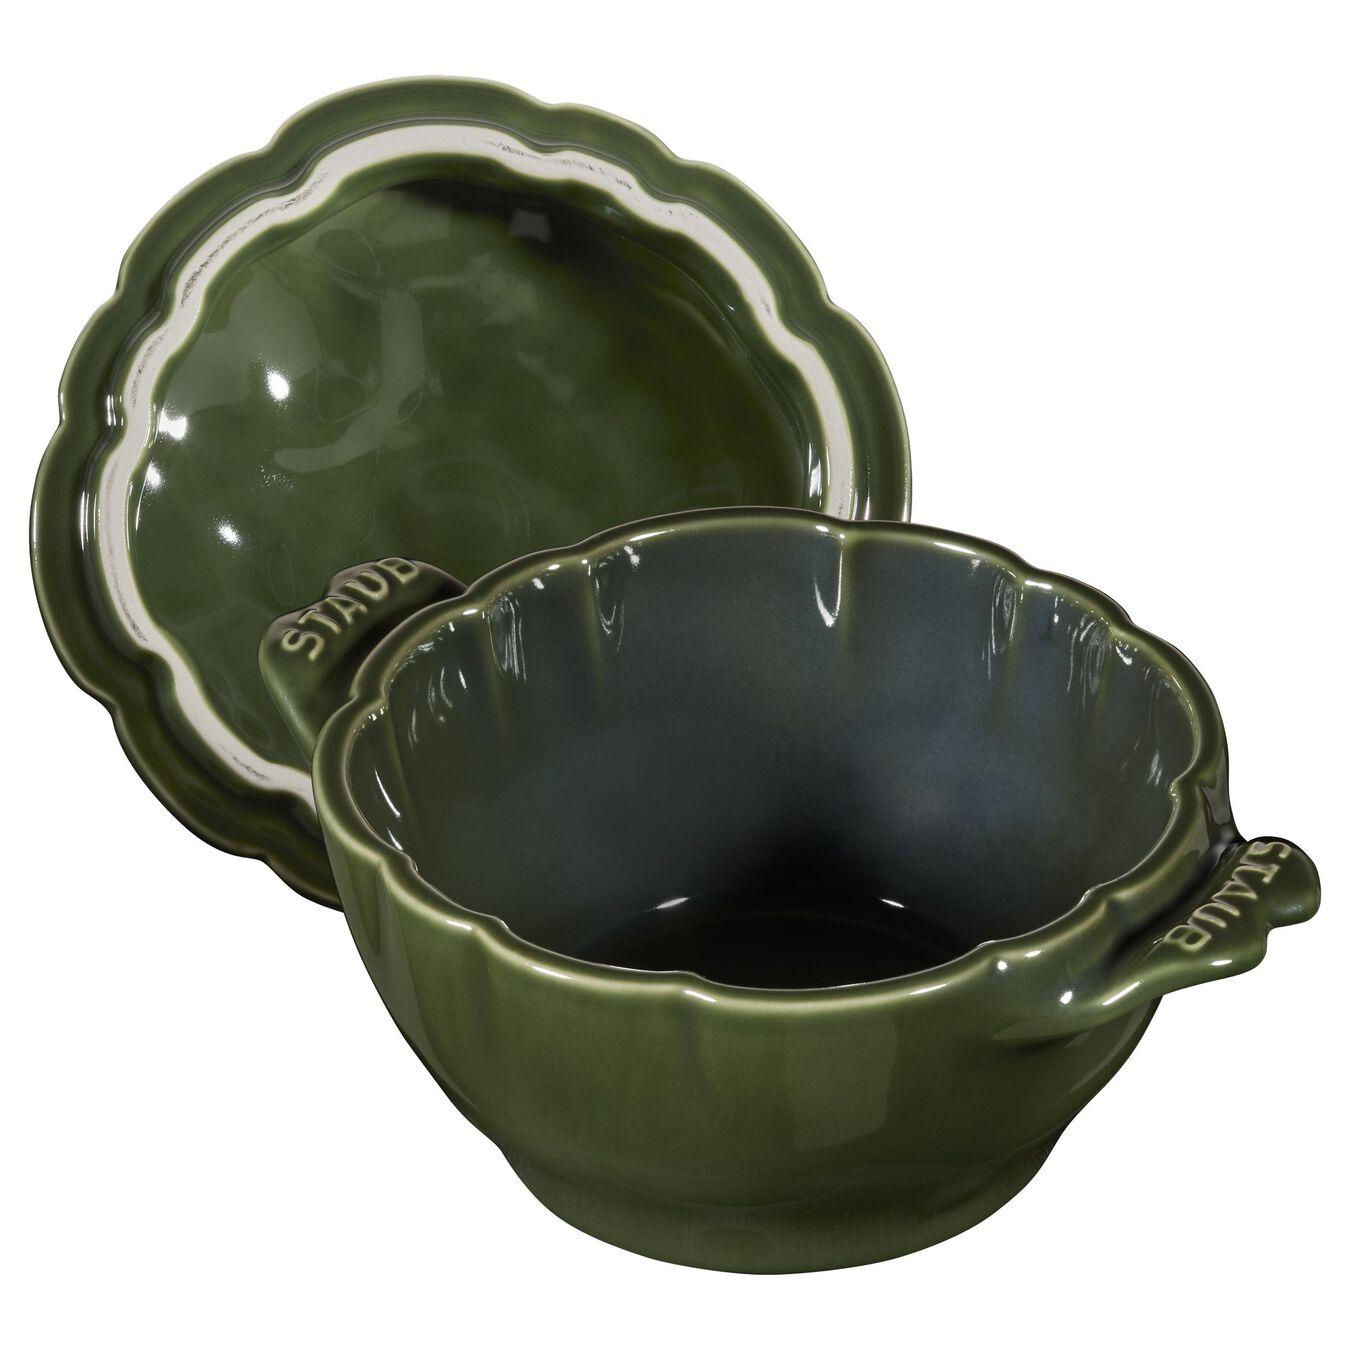 Cocotte 13 cm, Artischocke, Basilikum-Grün, Keramik,,large 5